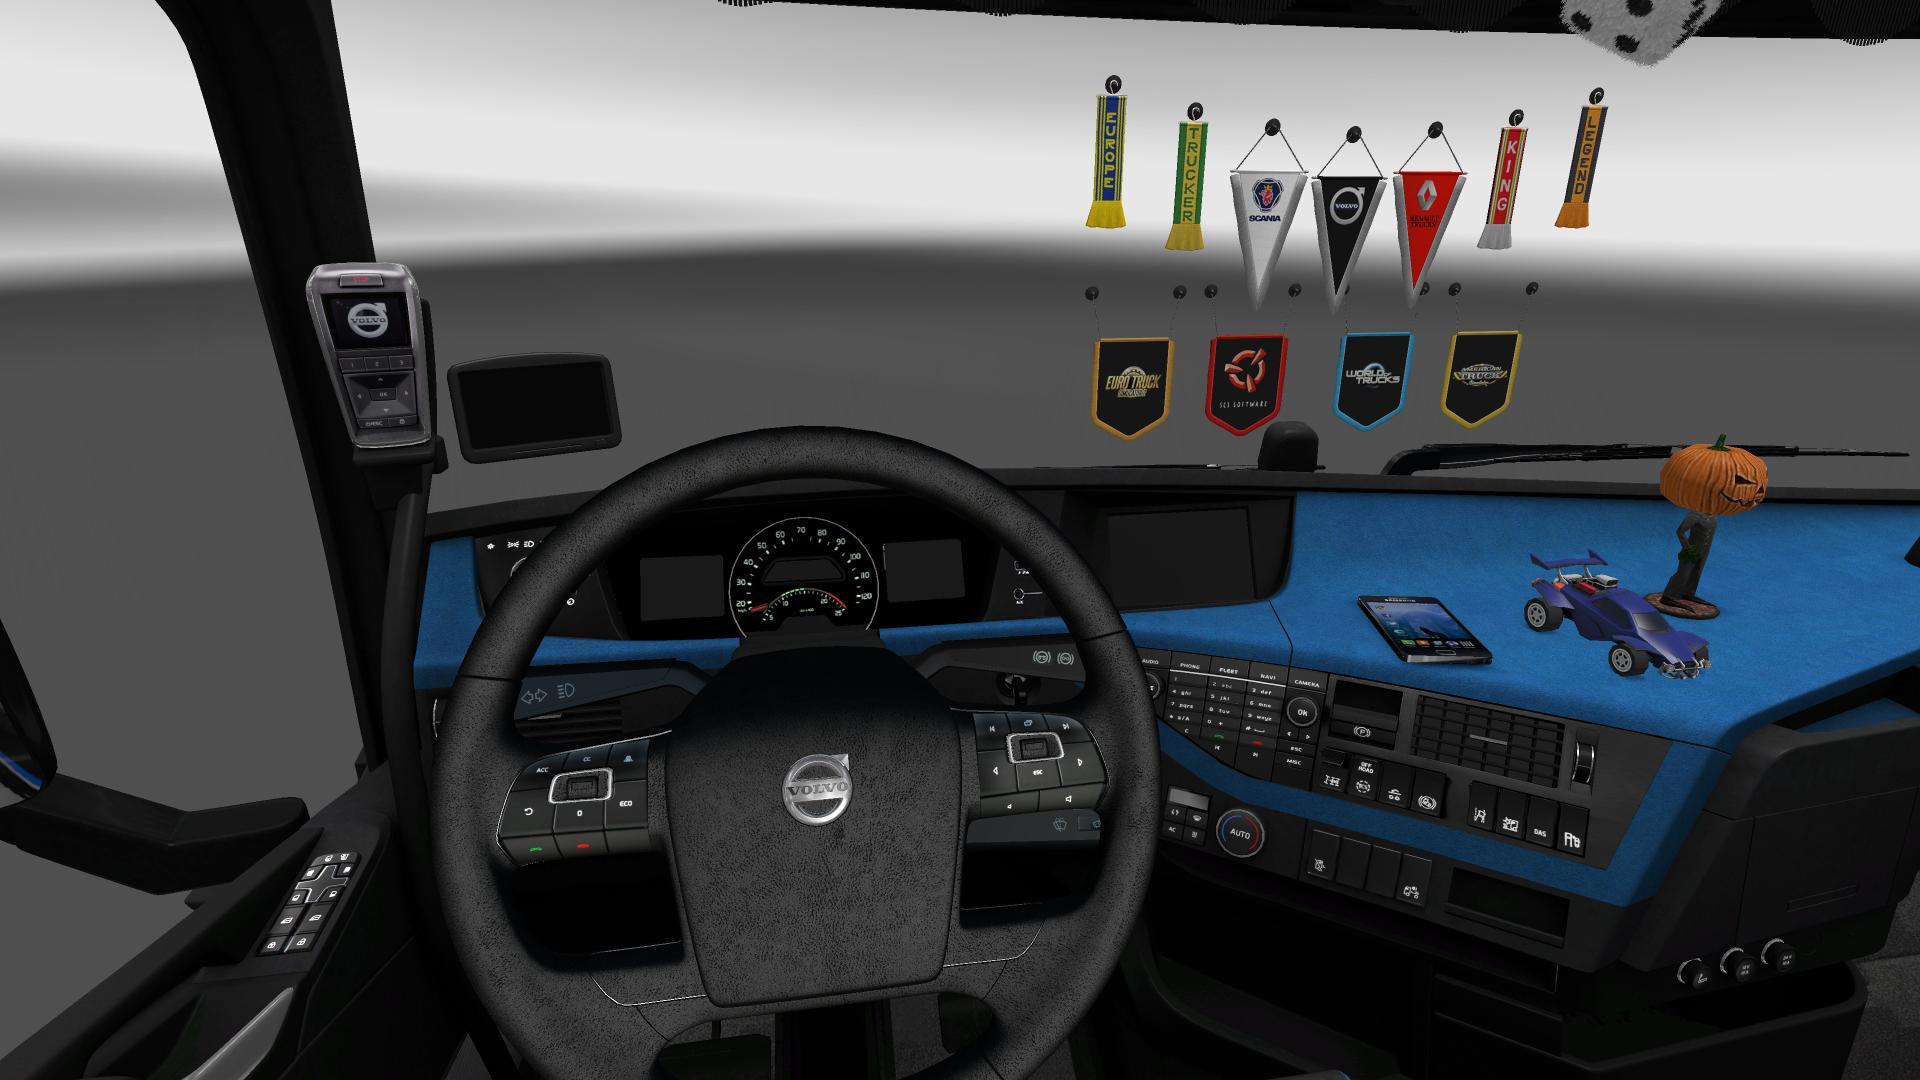 Volvo Fh16 750 Interior >> VOLVO FH16 750 FHTRANS + DLC 1.23.X - 1.23.3.1S Truck -Euro Truck Simulator 2 Mods